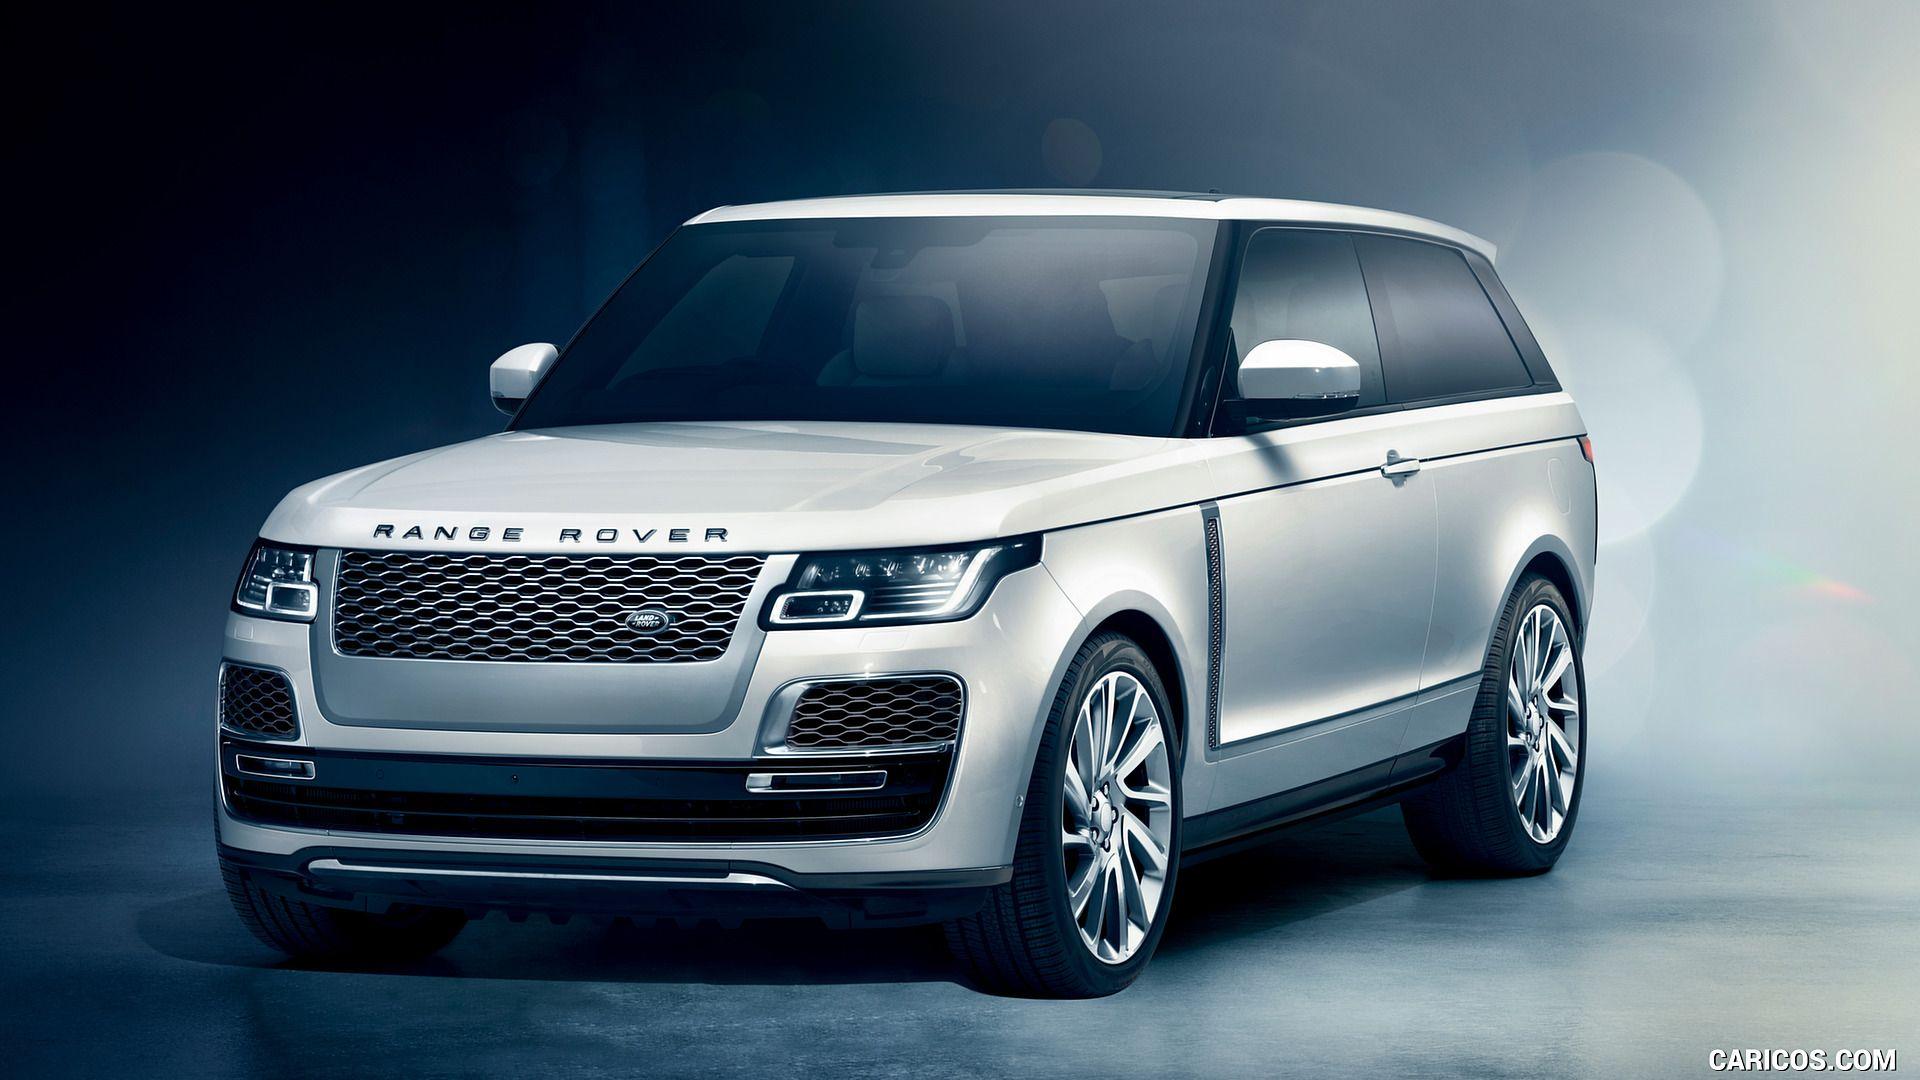 2019 Range Rover Sv Coupe Wallpaper Range Rover Sv Range Rover Coupe